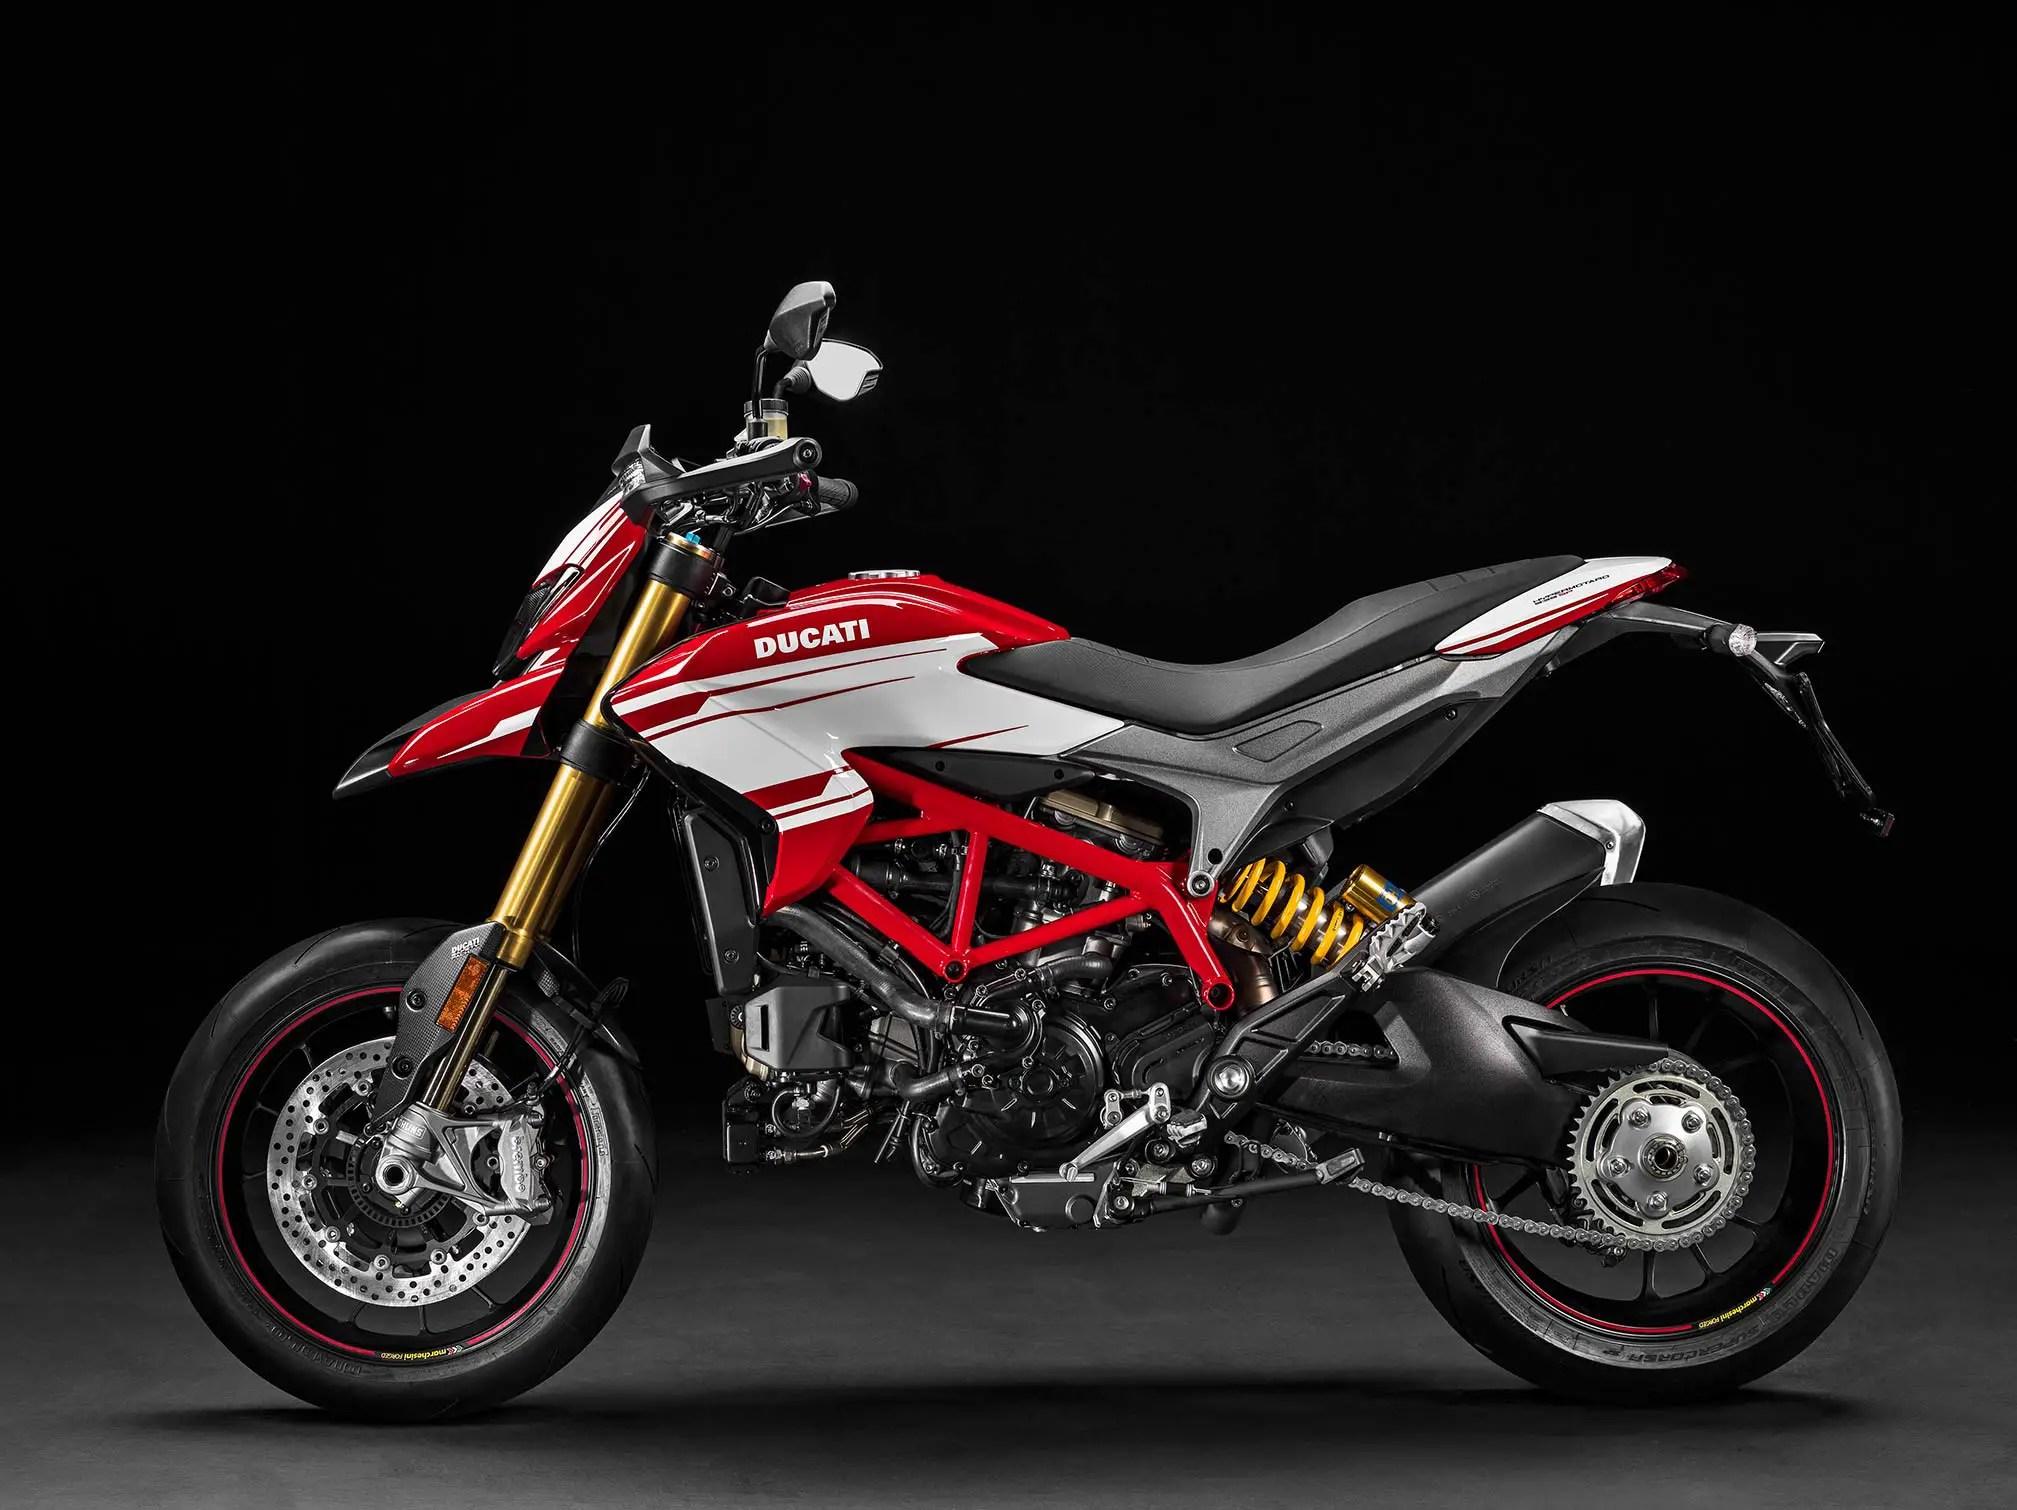 Wallpaper Hd Ducati 2017 Ducati Hypermotard 939 Sp Review